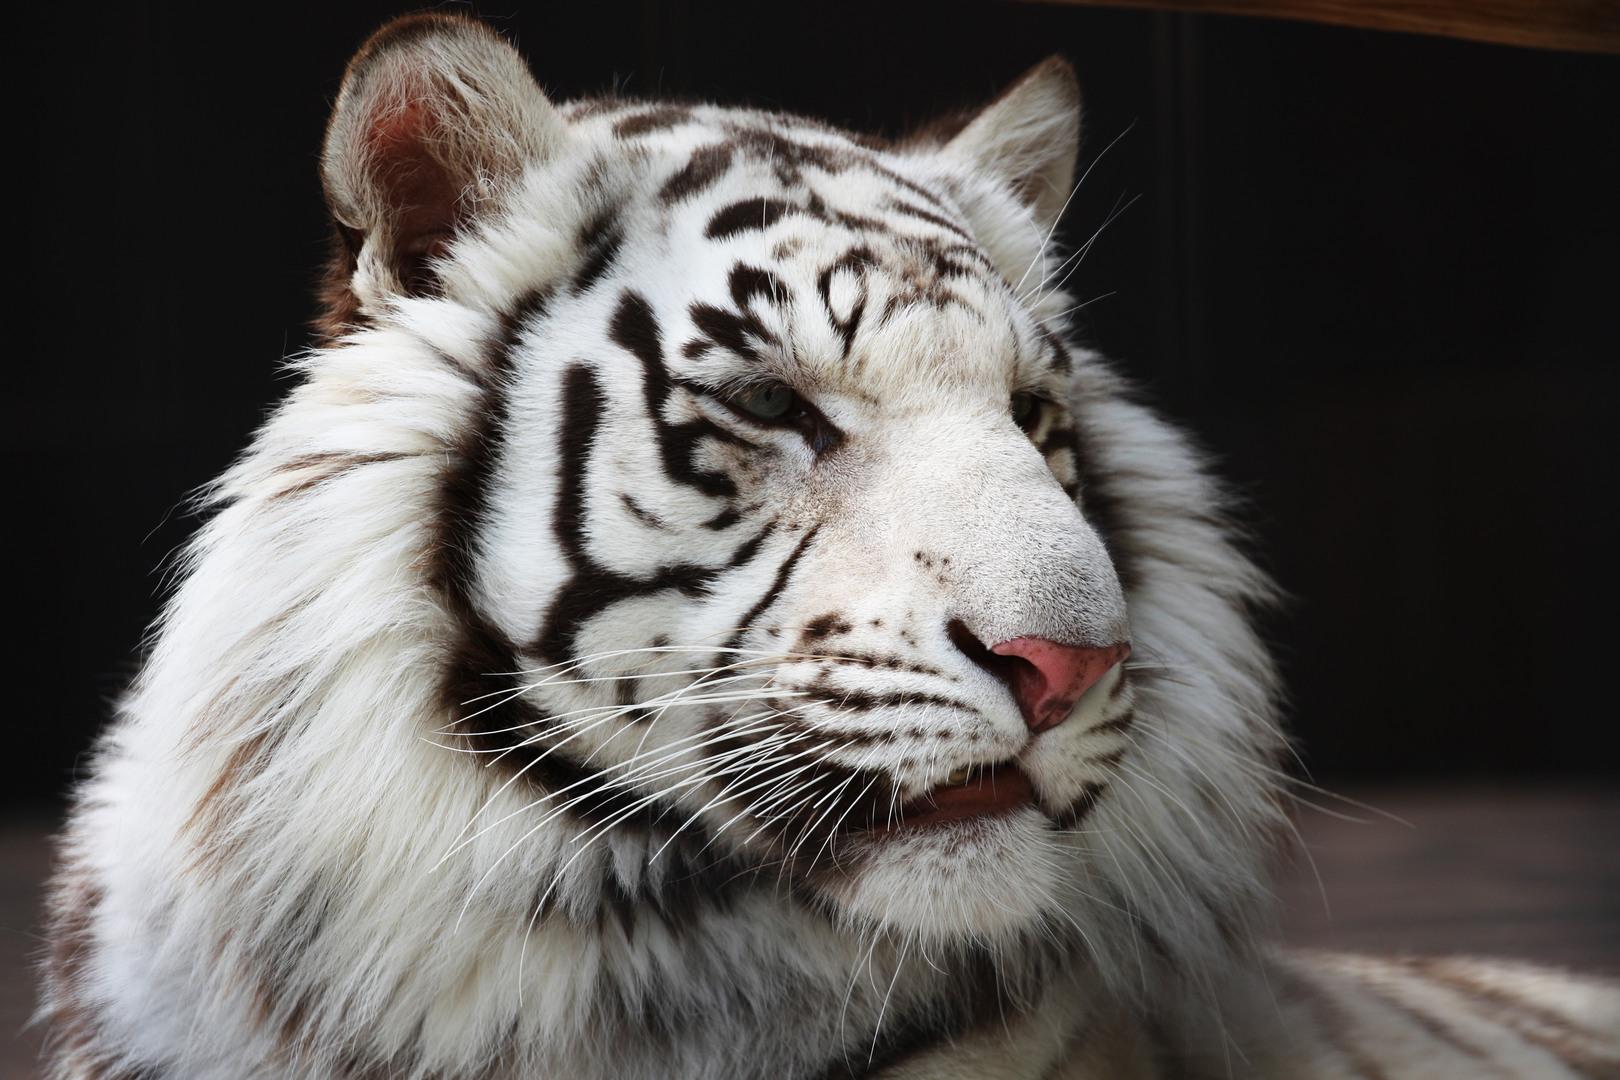 Wallpapers HD White Bengal Tiger Tiger Tiger Hd White 1620x1080